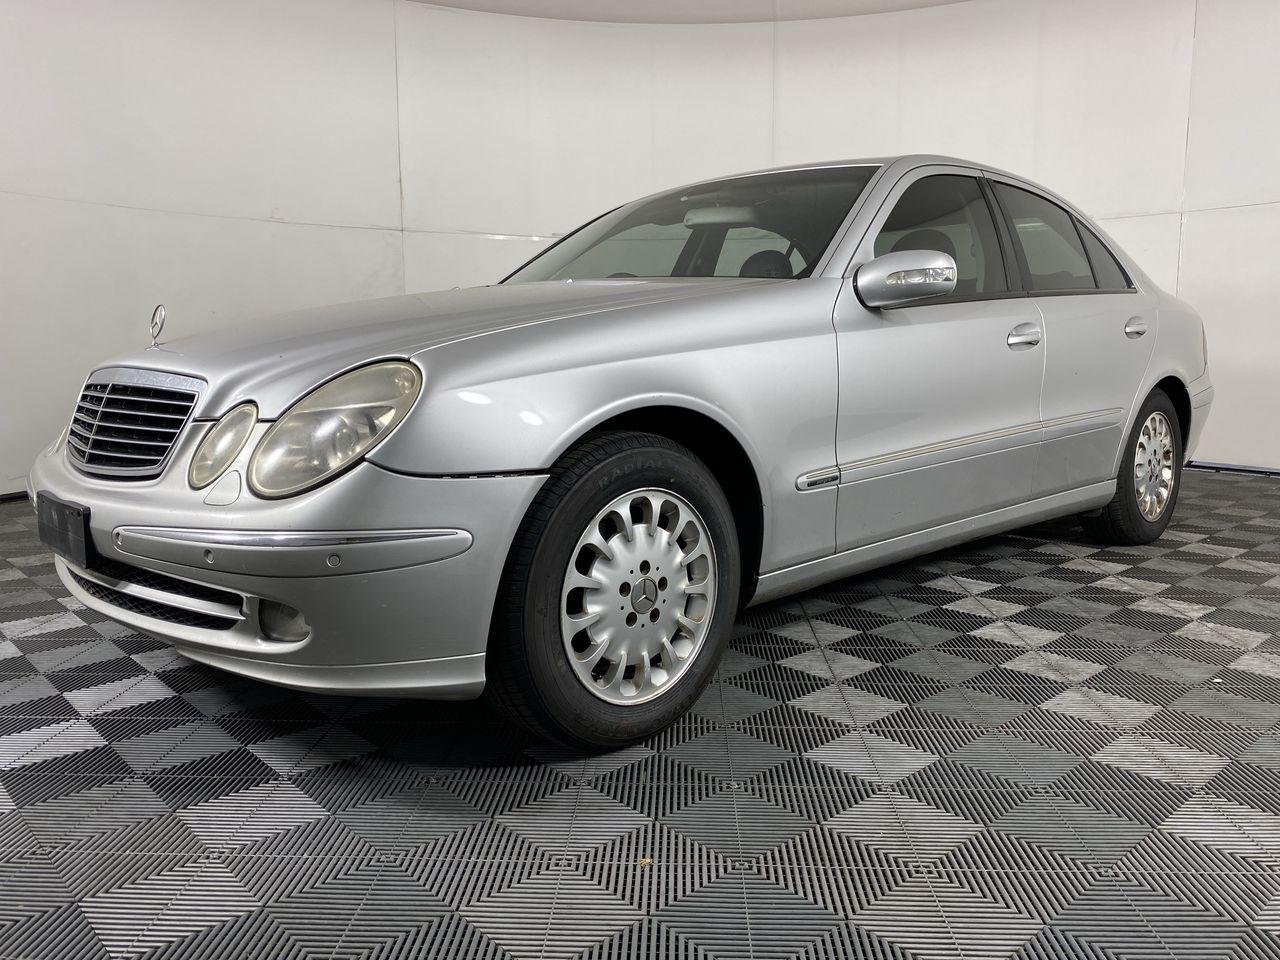 2002 Mercedes Benz E240 Classic W211 Automatic Sedan(WOVR-Inspected)